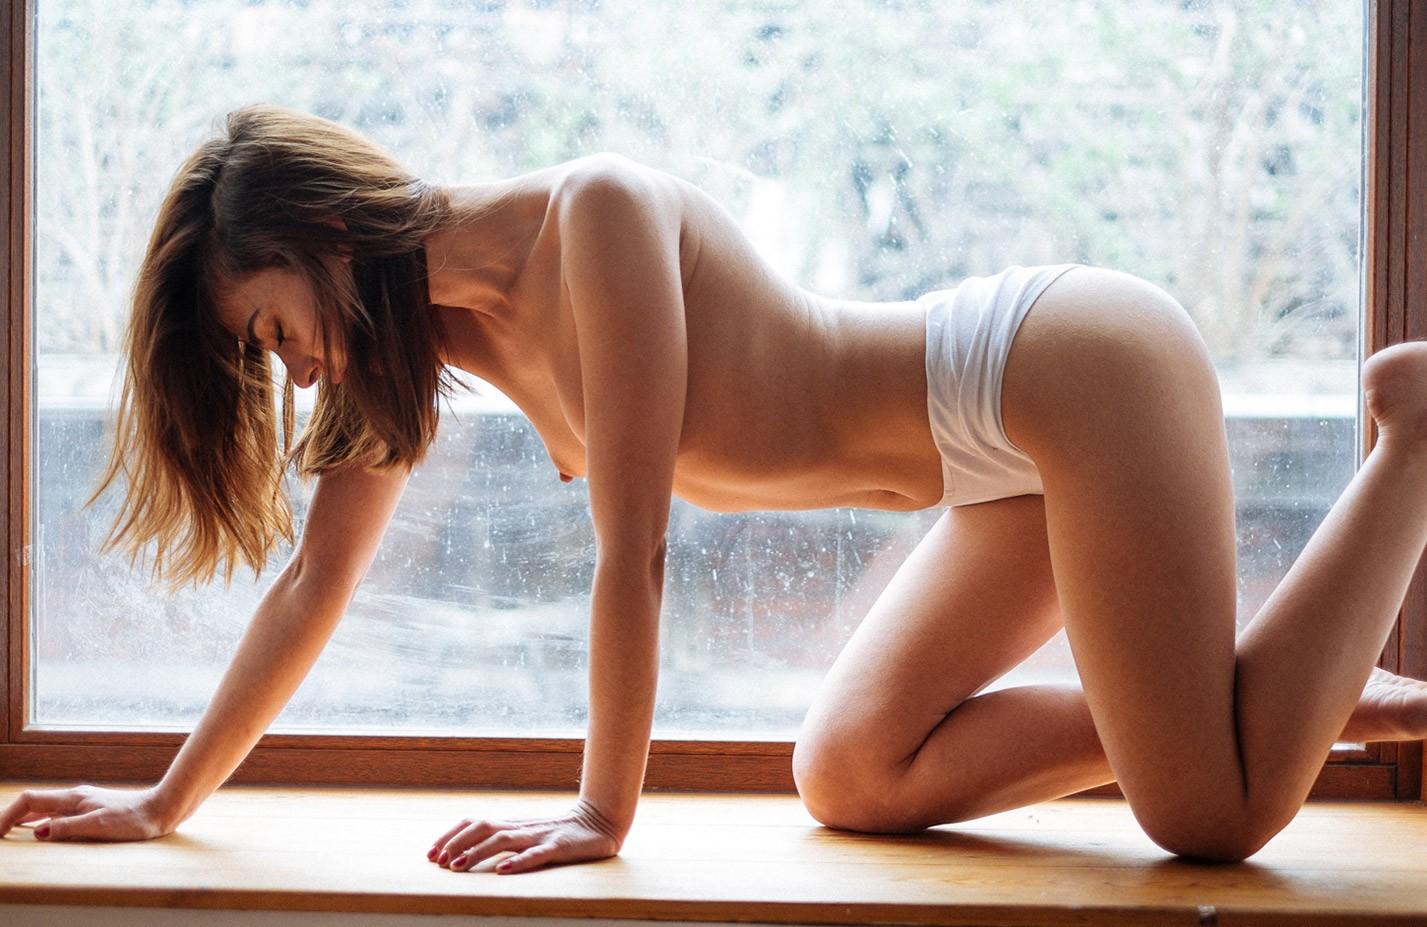 обнаженная Селин Джермэйн у окна / Celine Germain nude by Julien LRVR - Yume Magazine